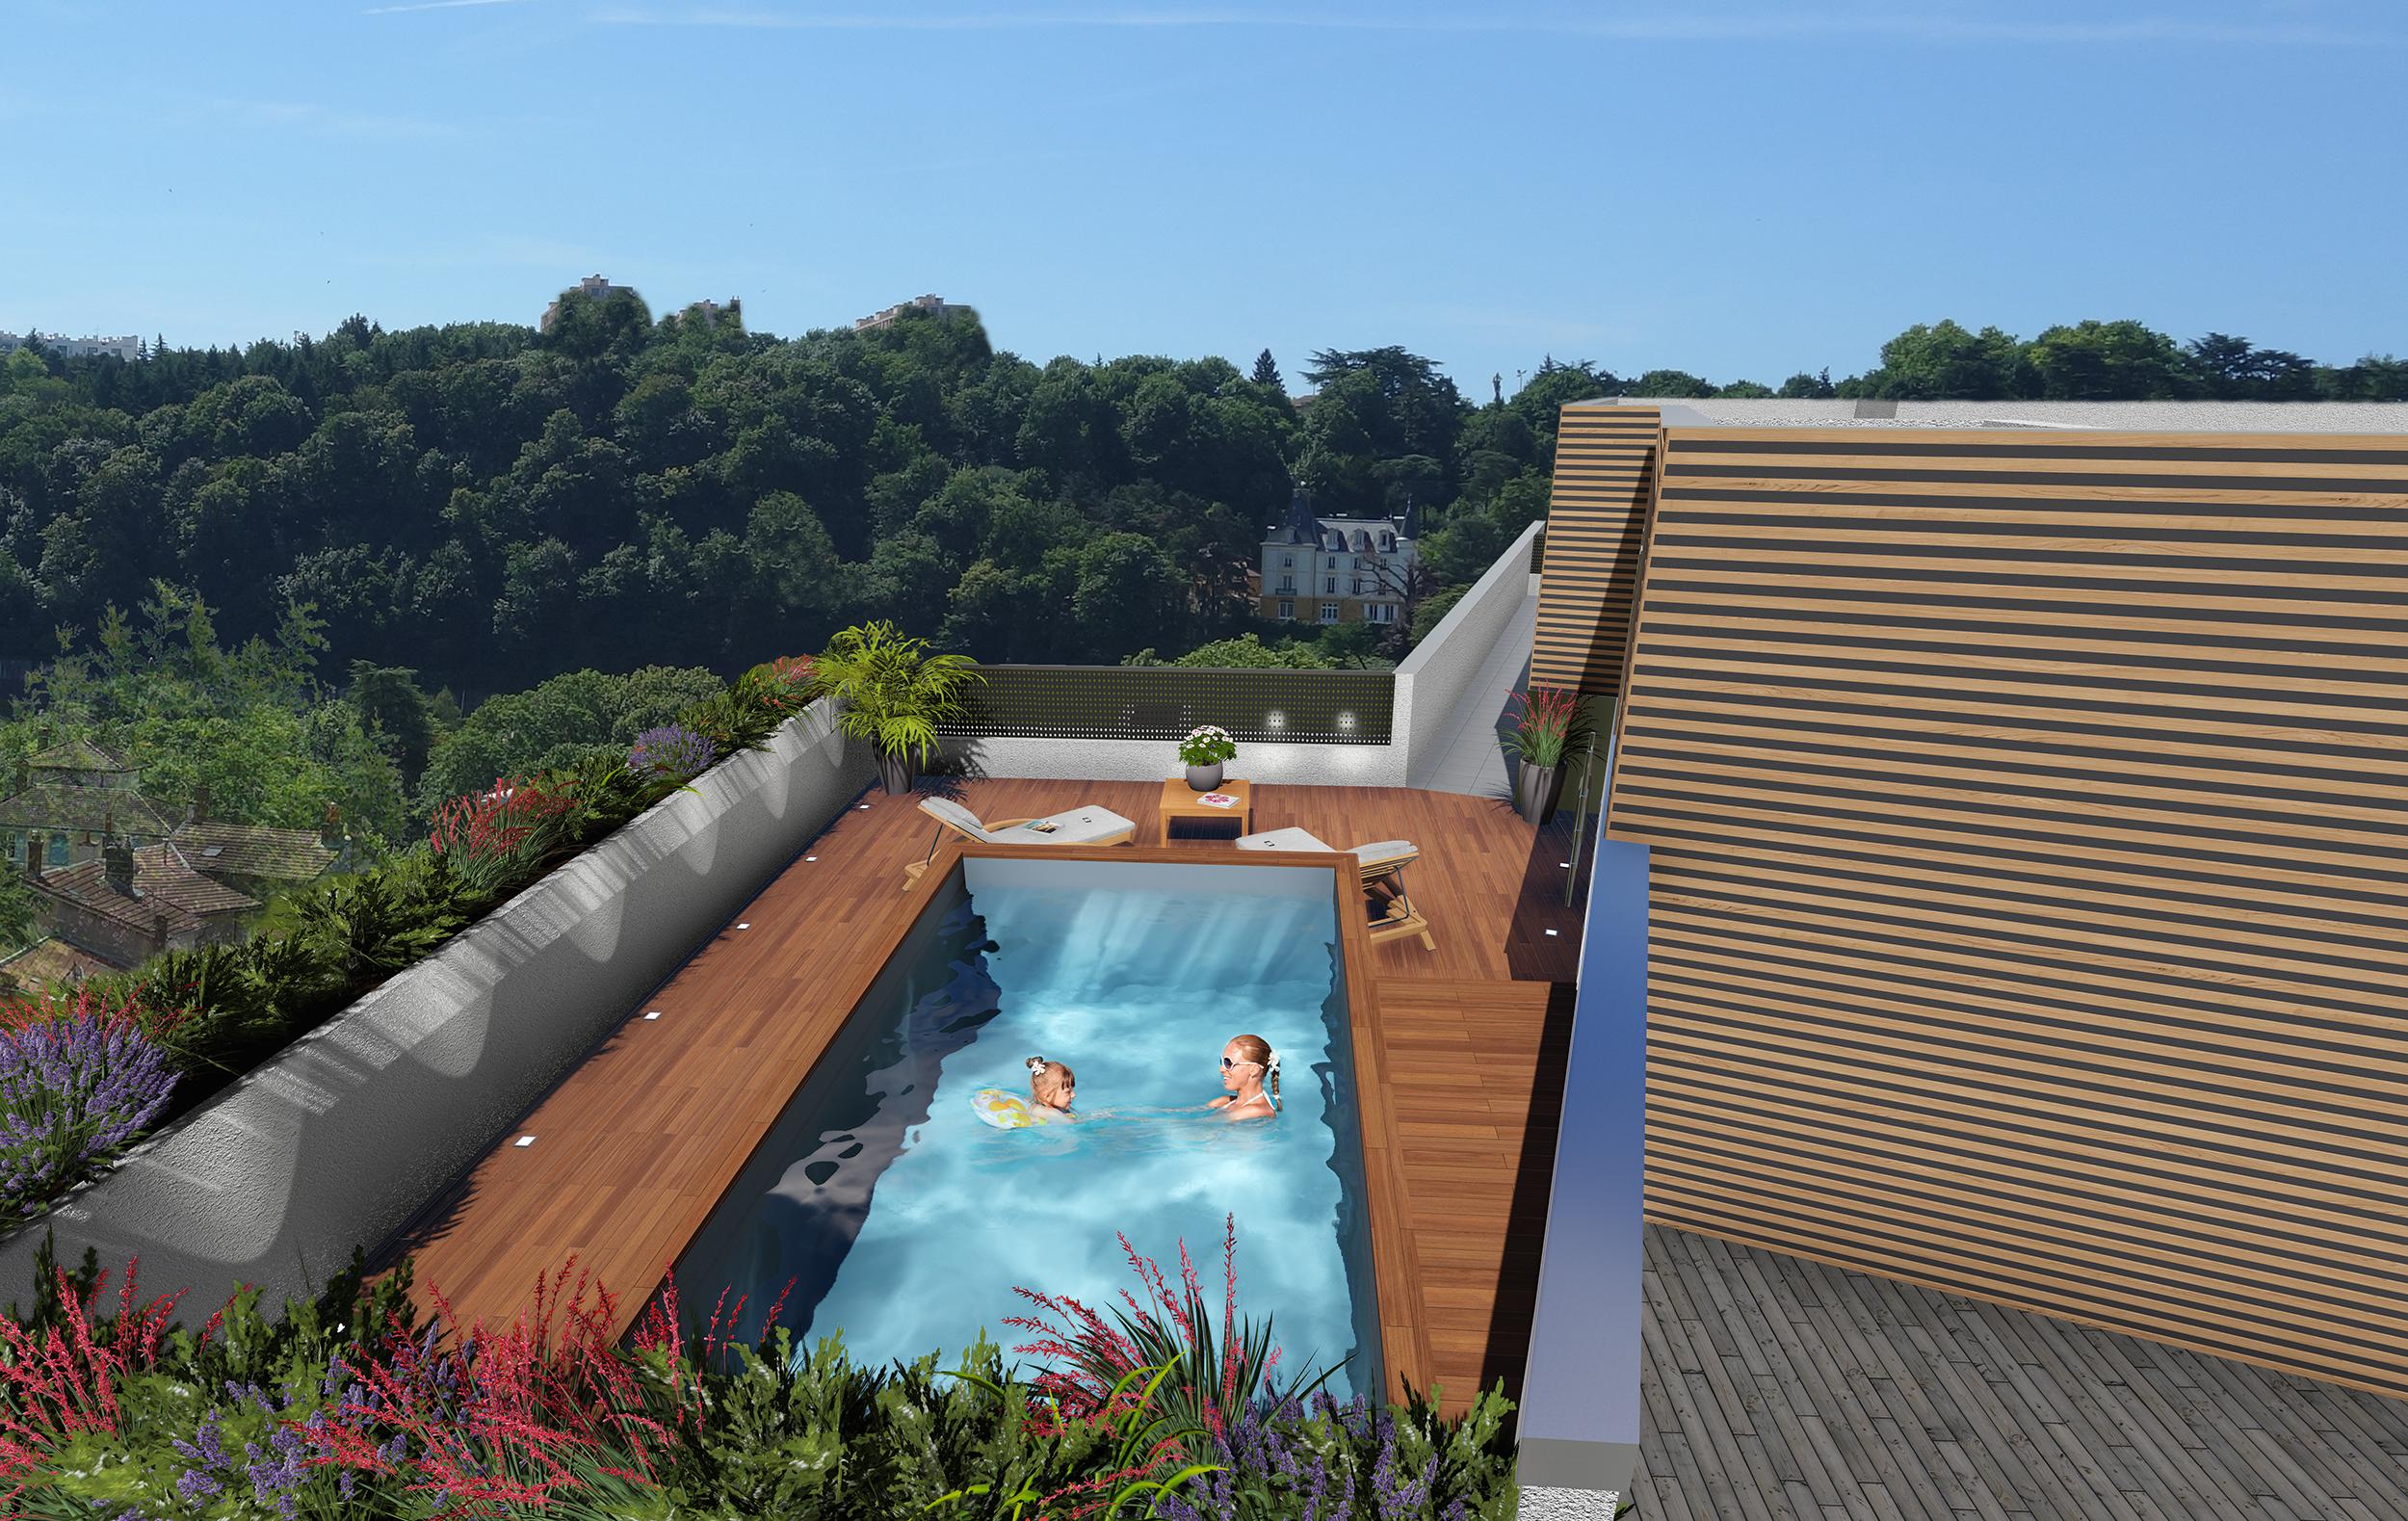 Appartement avec piscine à Lyon, quartier de Saint-Rambert